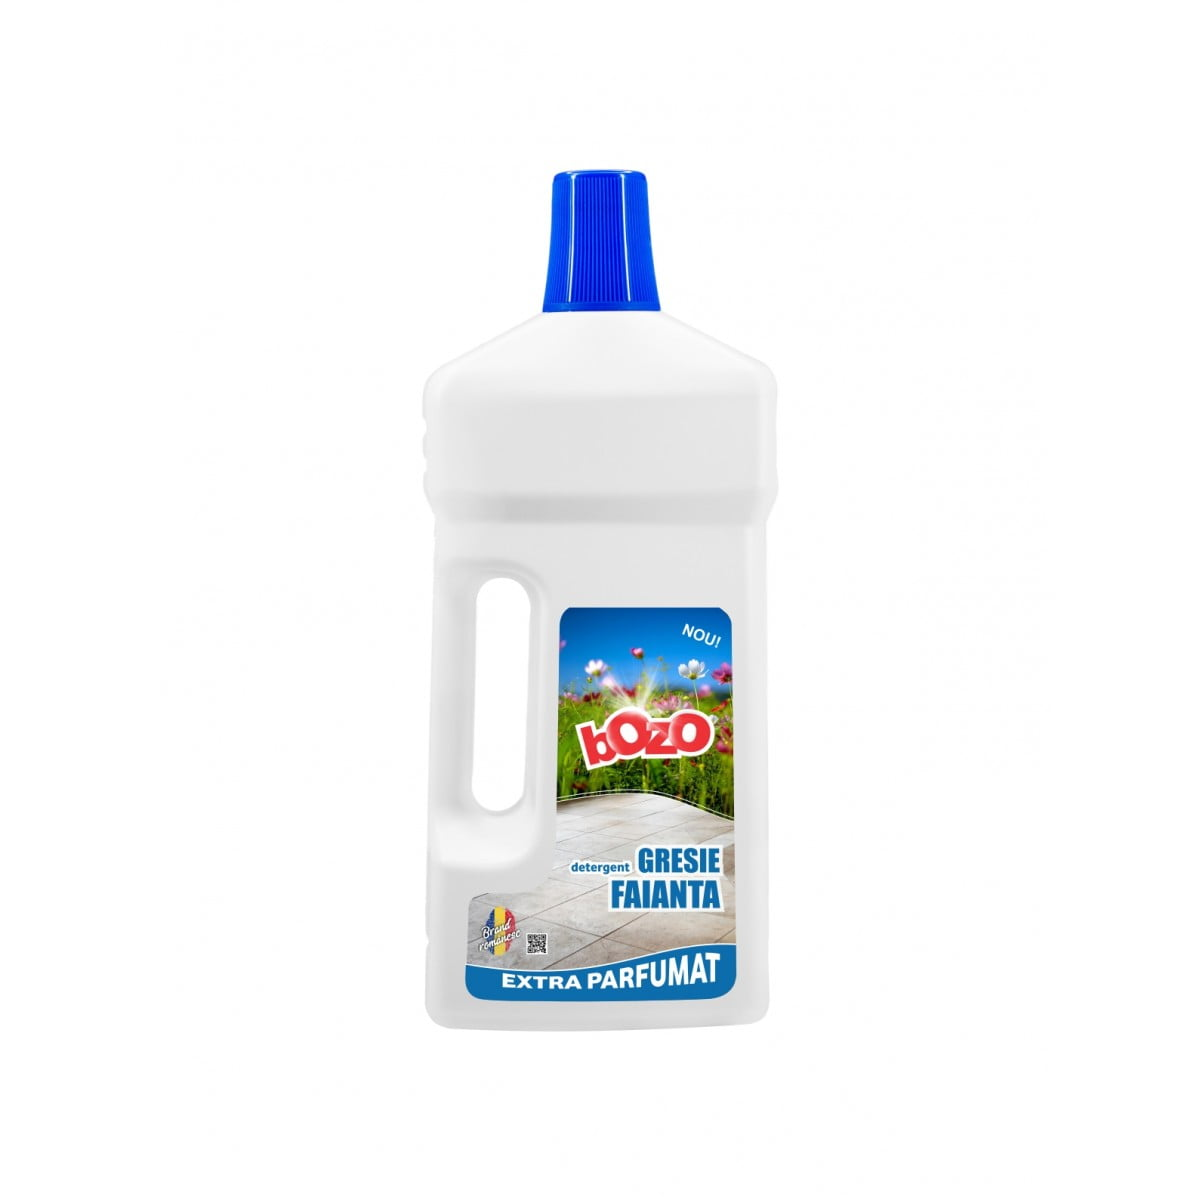 Detergent concentrat gresie faianta, Bozo, 1 kg poza somnart.ro